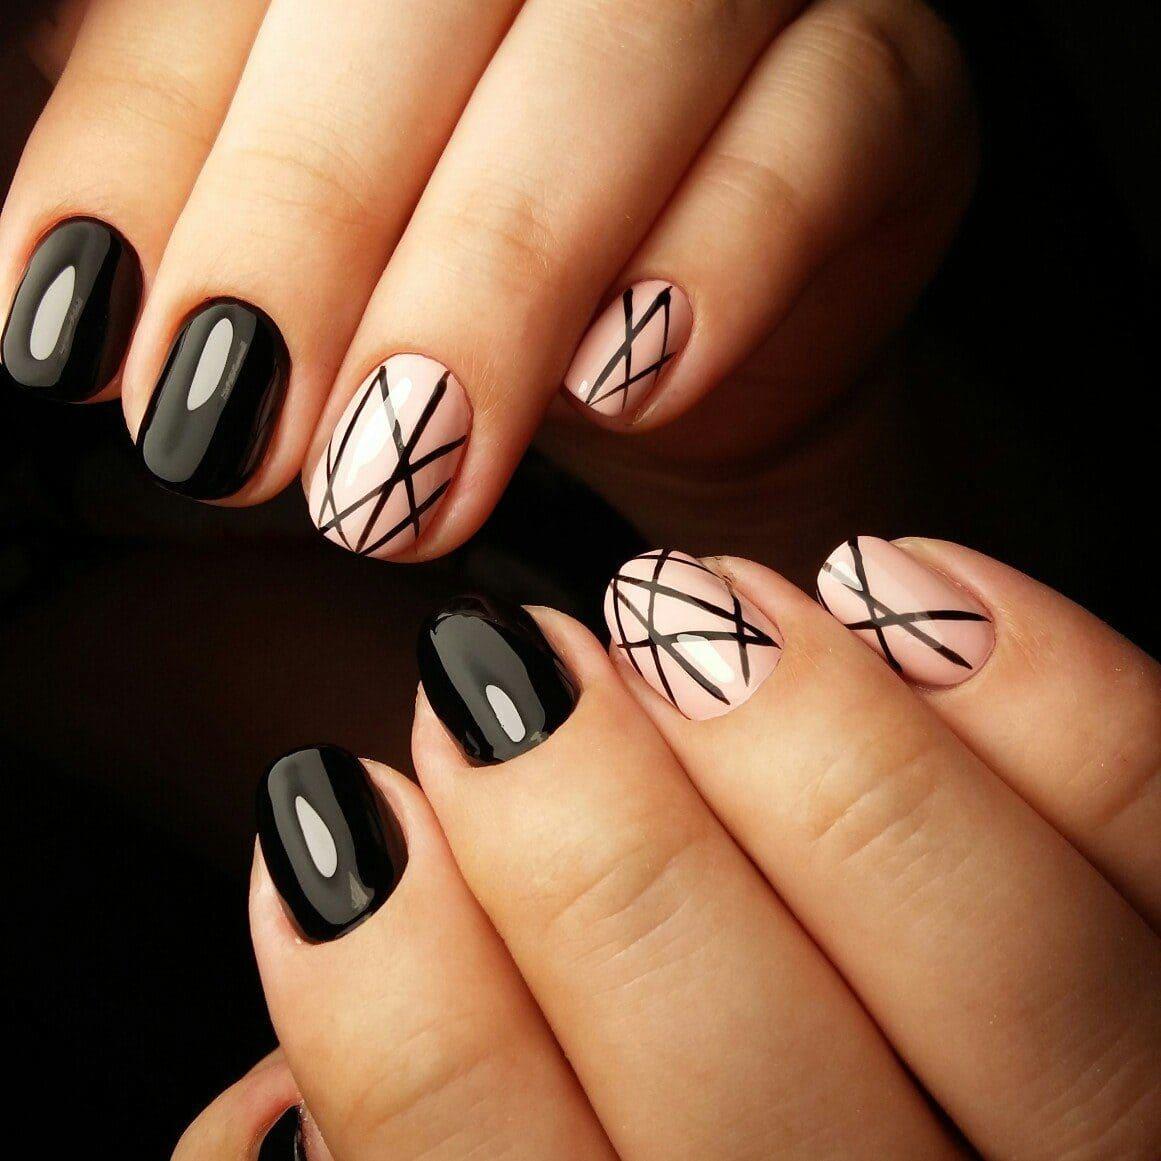 для широких ногтей